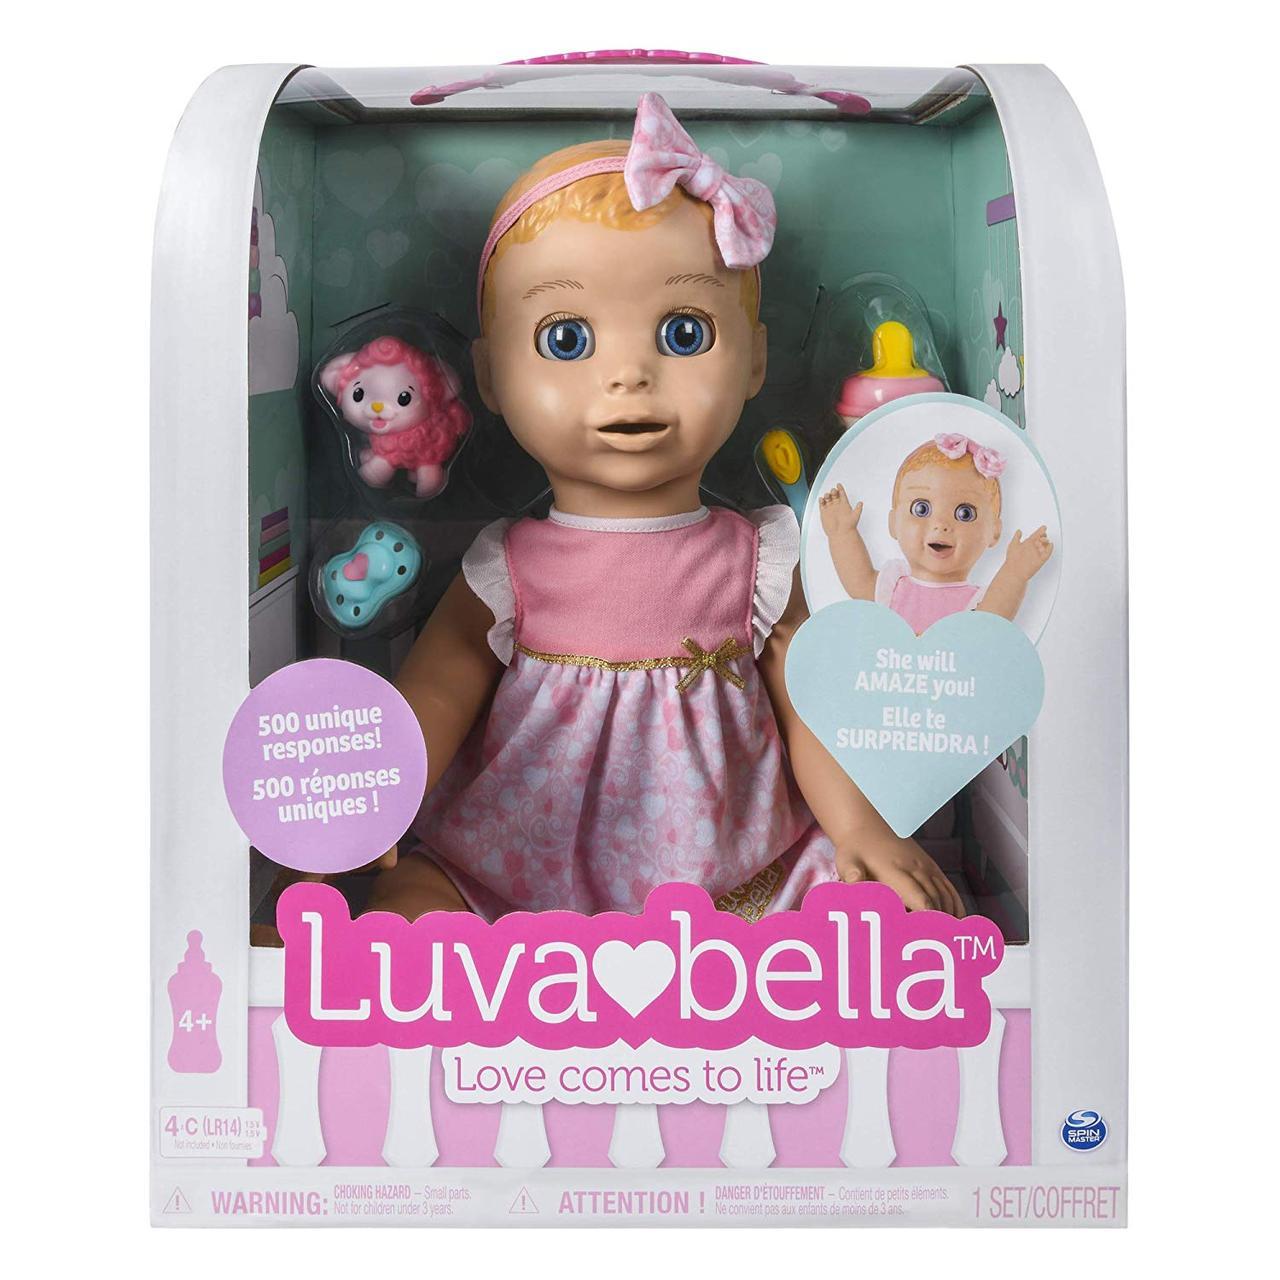 Кукла Лувабелла оригинал интерактивная Luvabella Spin Master